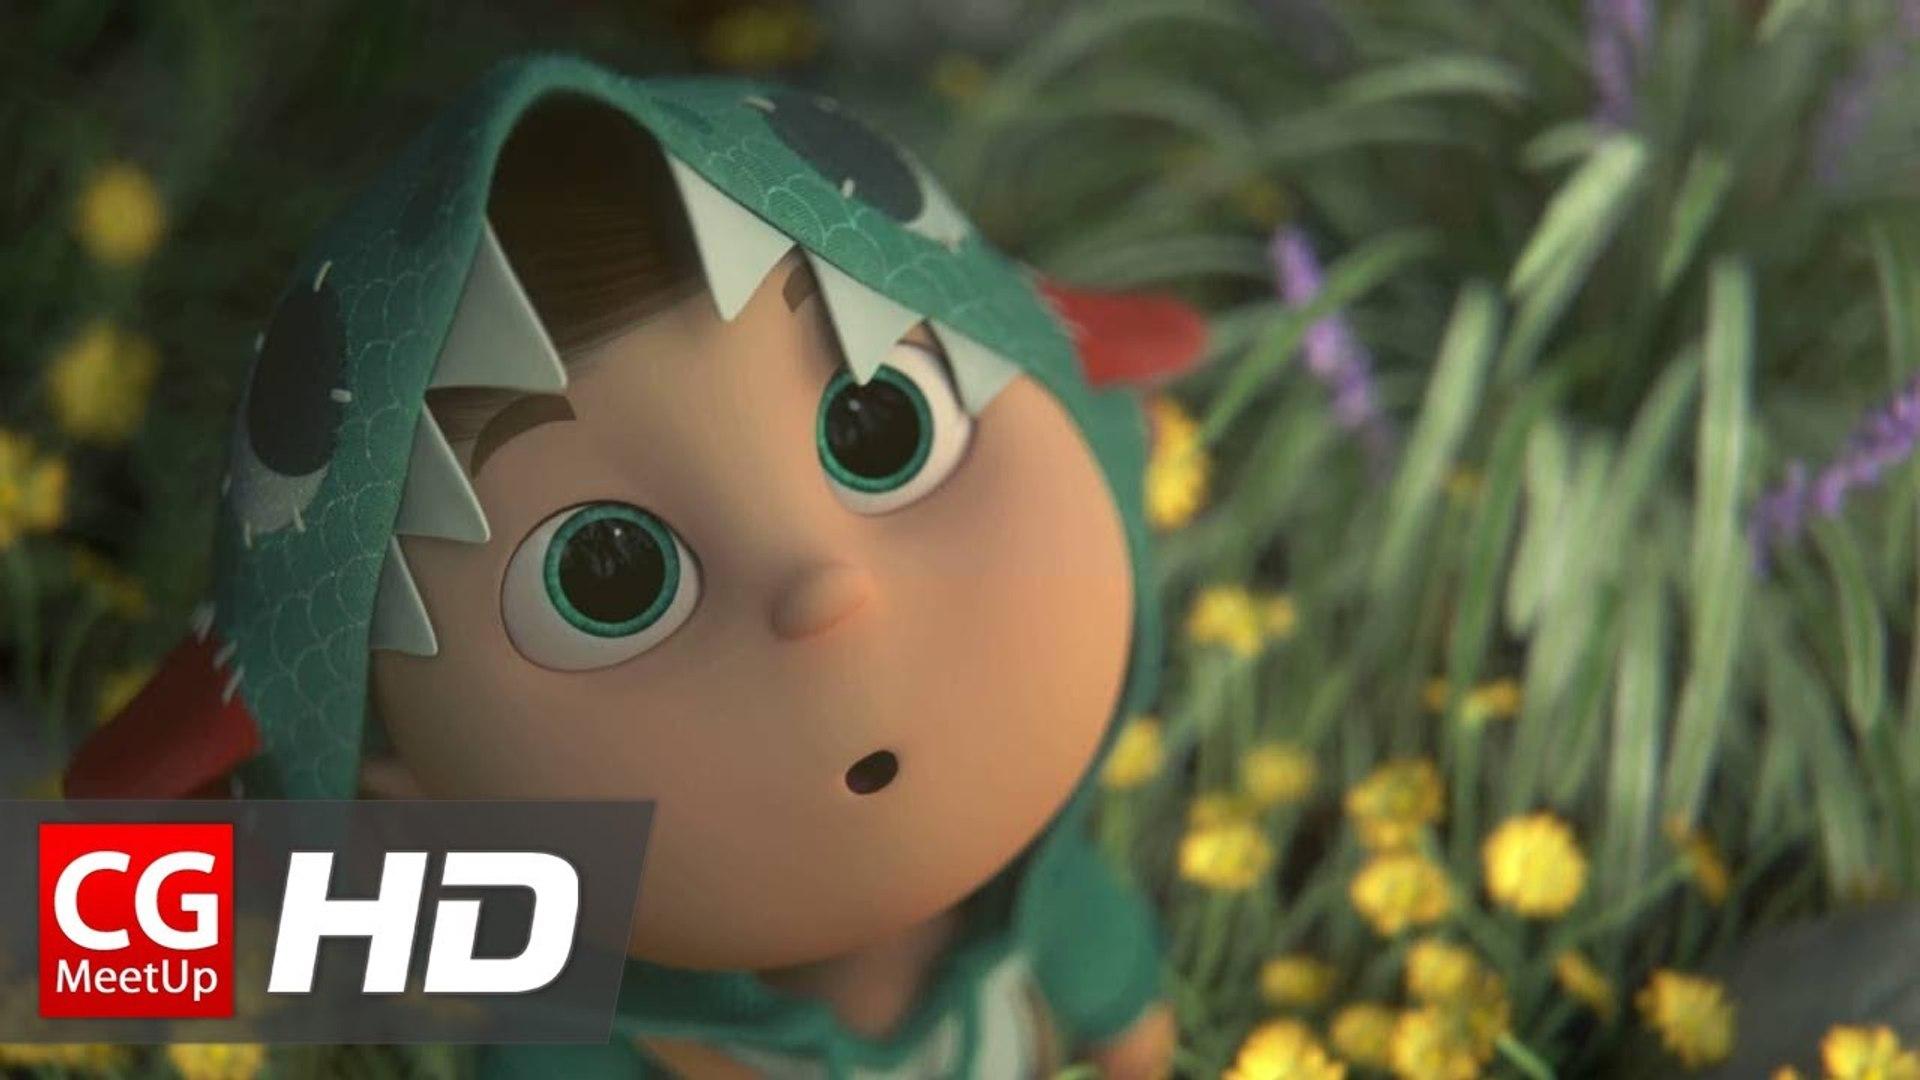 CGI Animated Spot HD